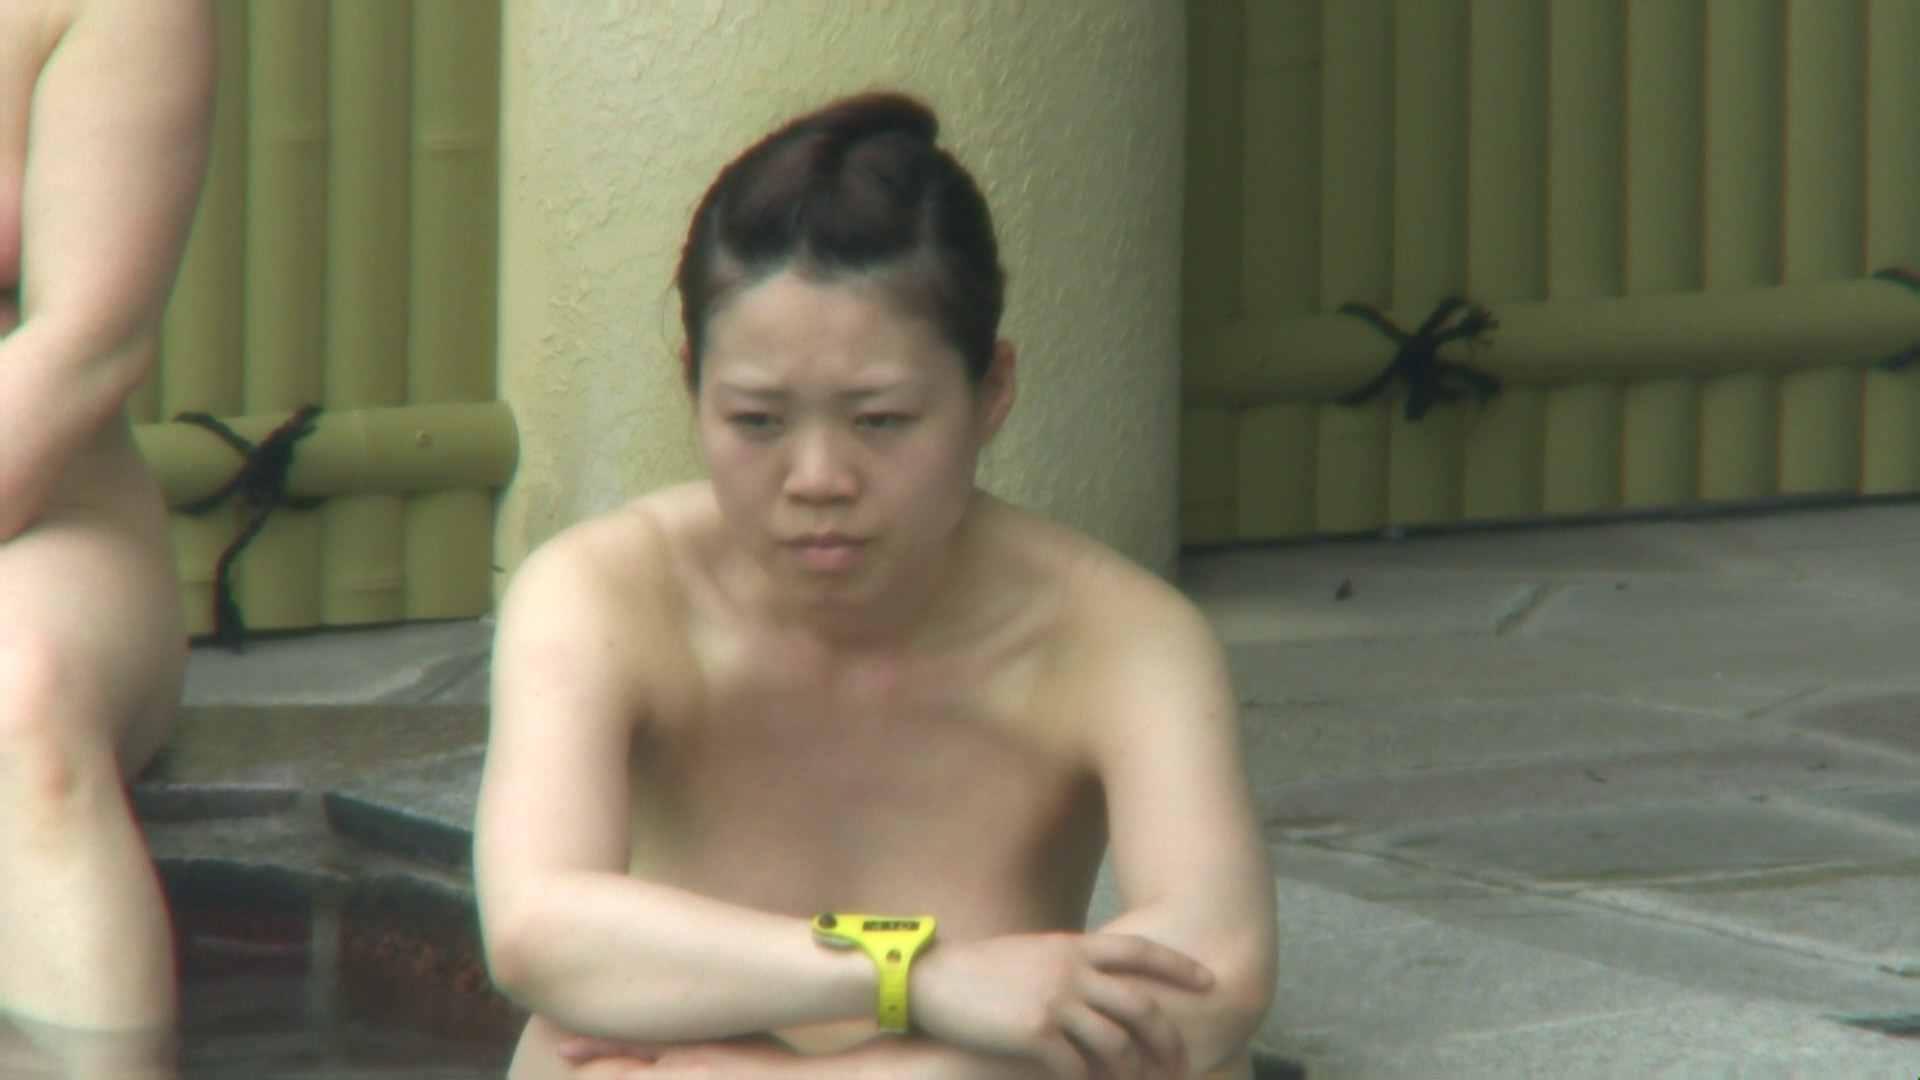 Aquaな露天風呂Vol.63【VIP限定】 露天風呂編 | 盗撮シリーズ  109PIX 39